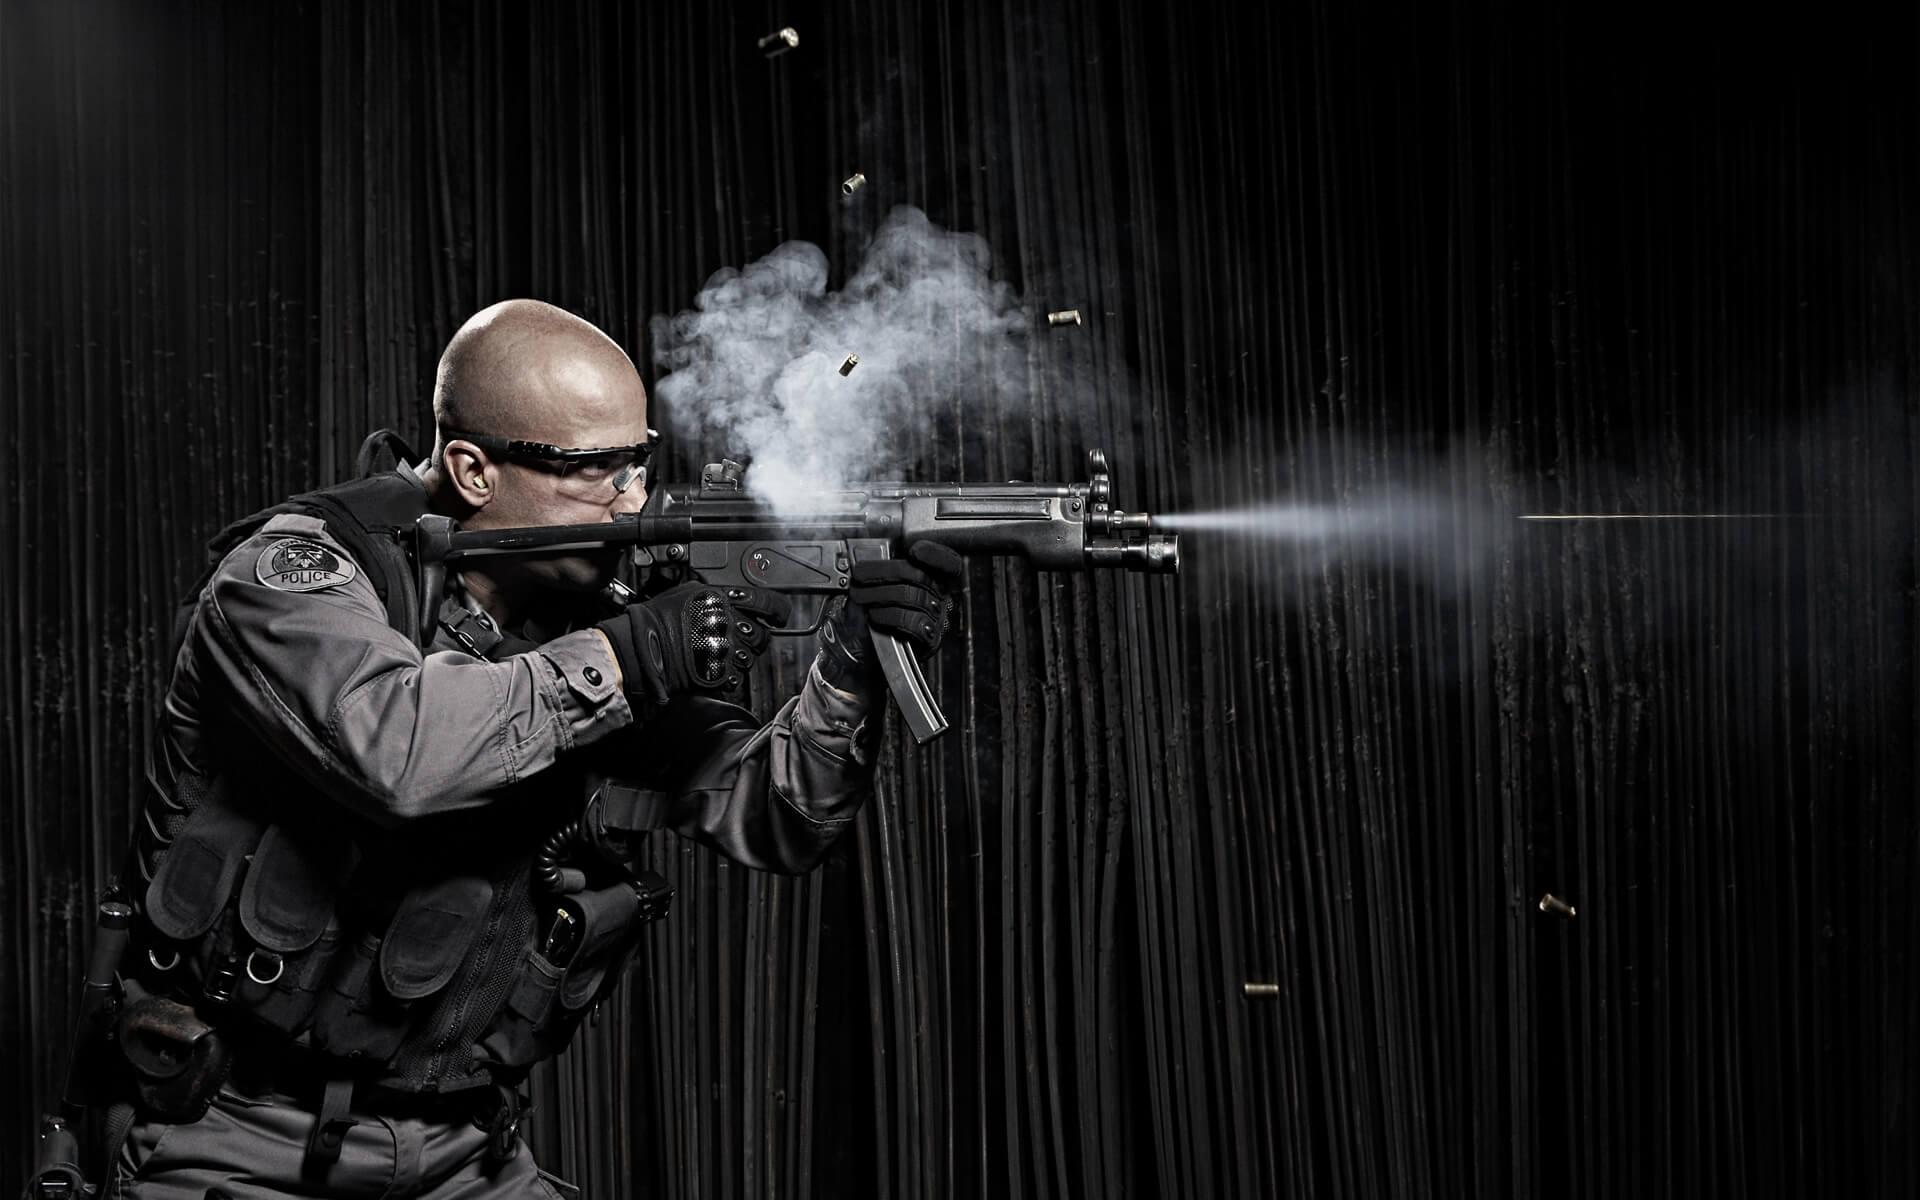 Unified Content, Unified Content Toronto, Aaron Cobb, Swat, Swat Team, Action shot, dramatic photography, dramatic portrait, action portrait, photography, combat, soldiers, portrait